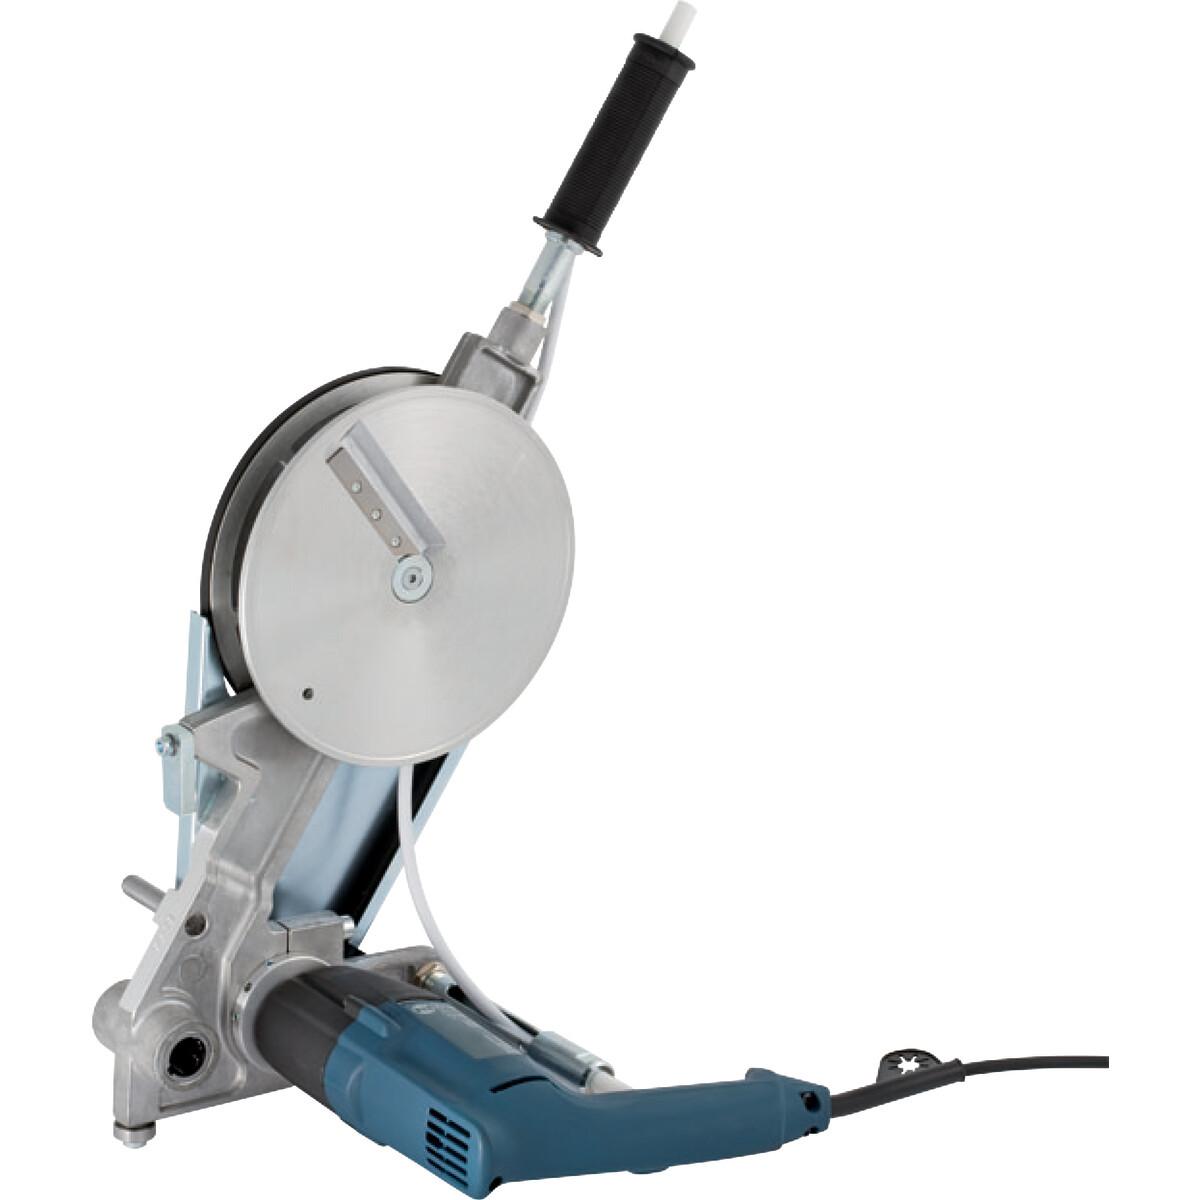 Rabot électrique Geberit, 230 V: d=40-160 mm